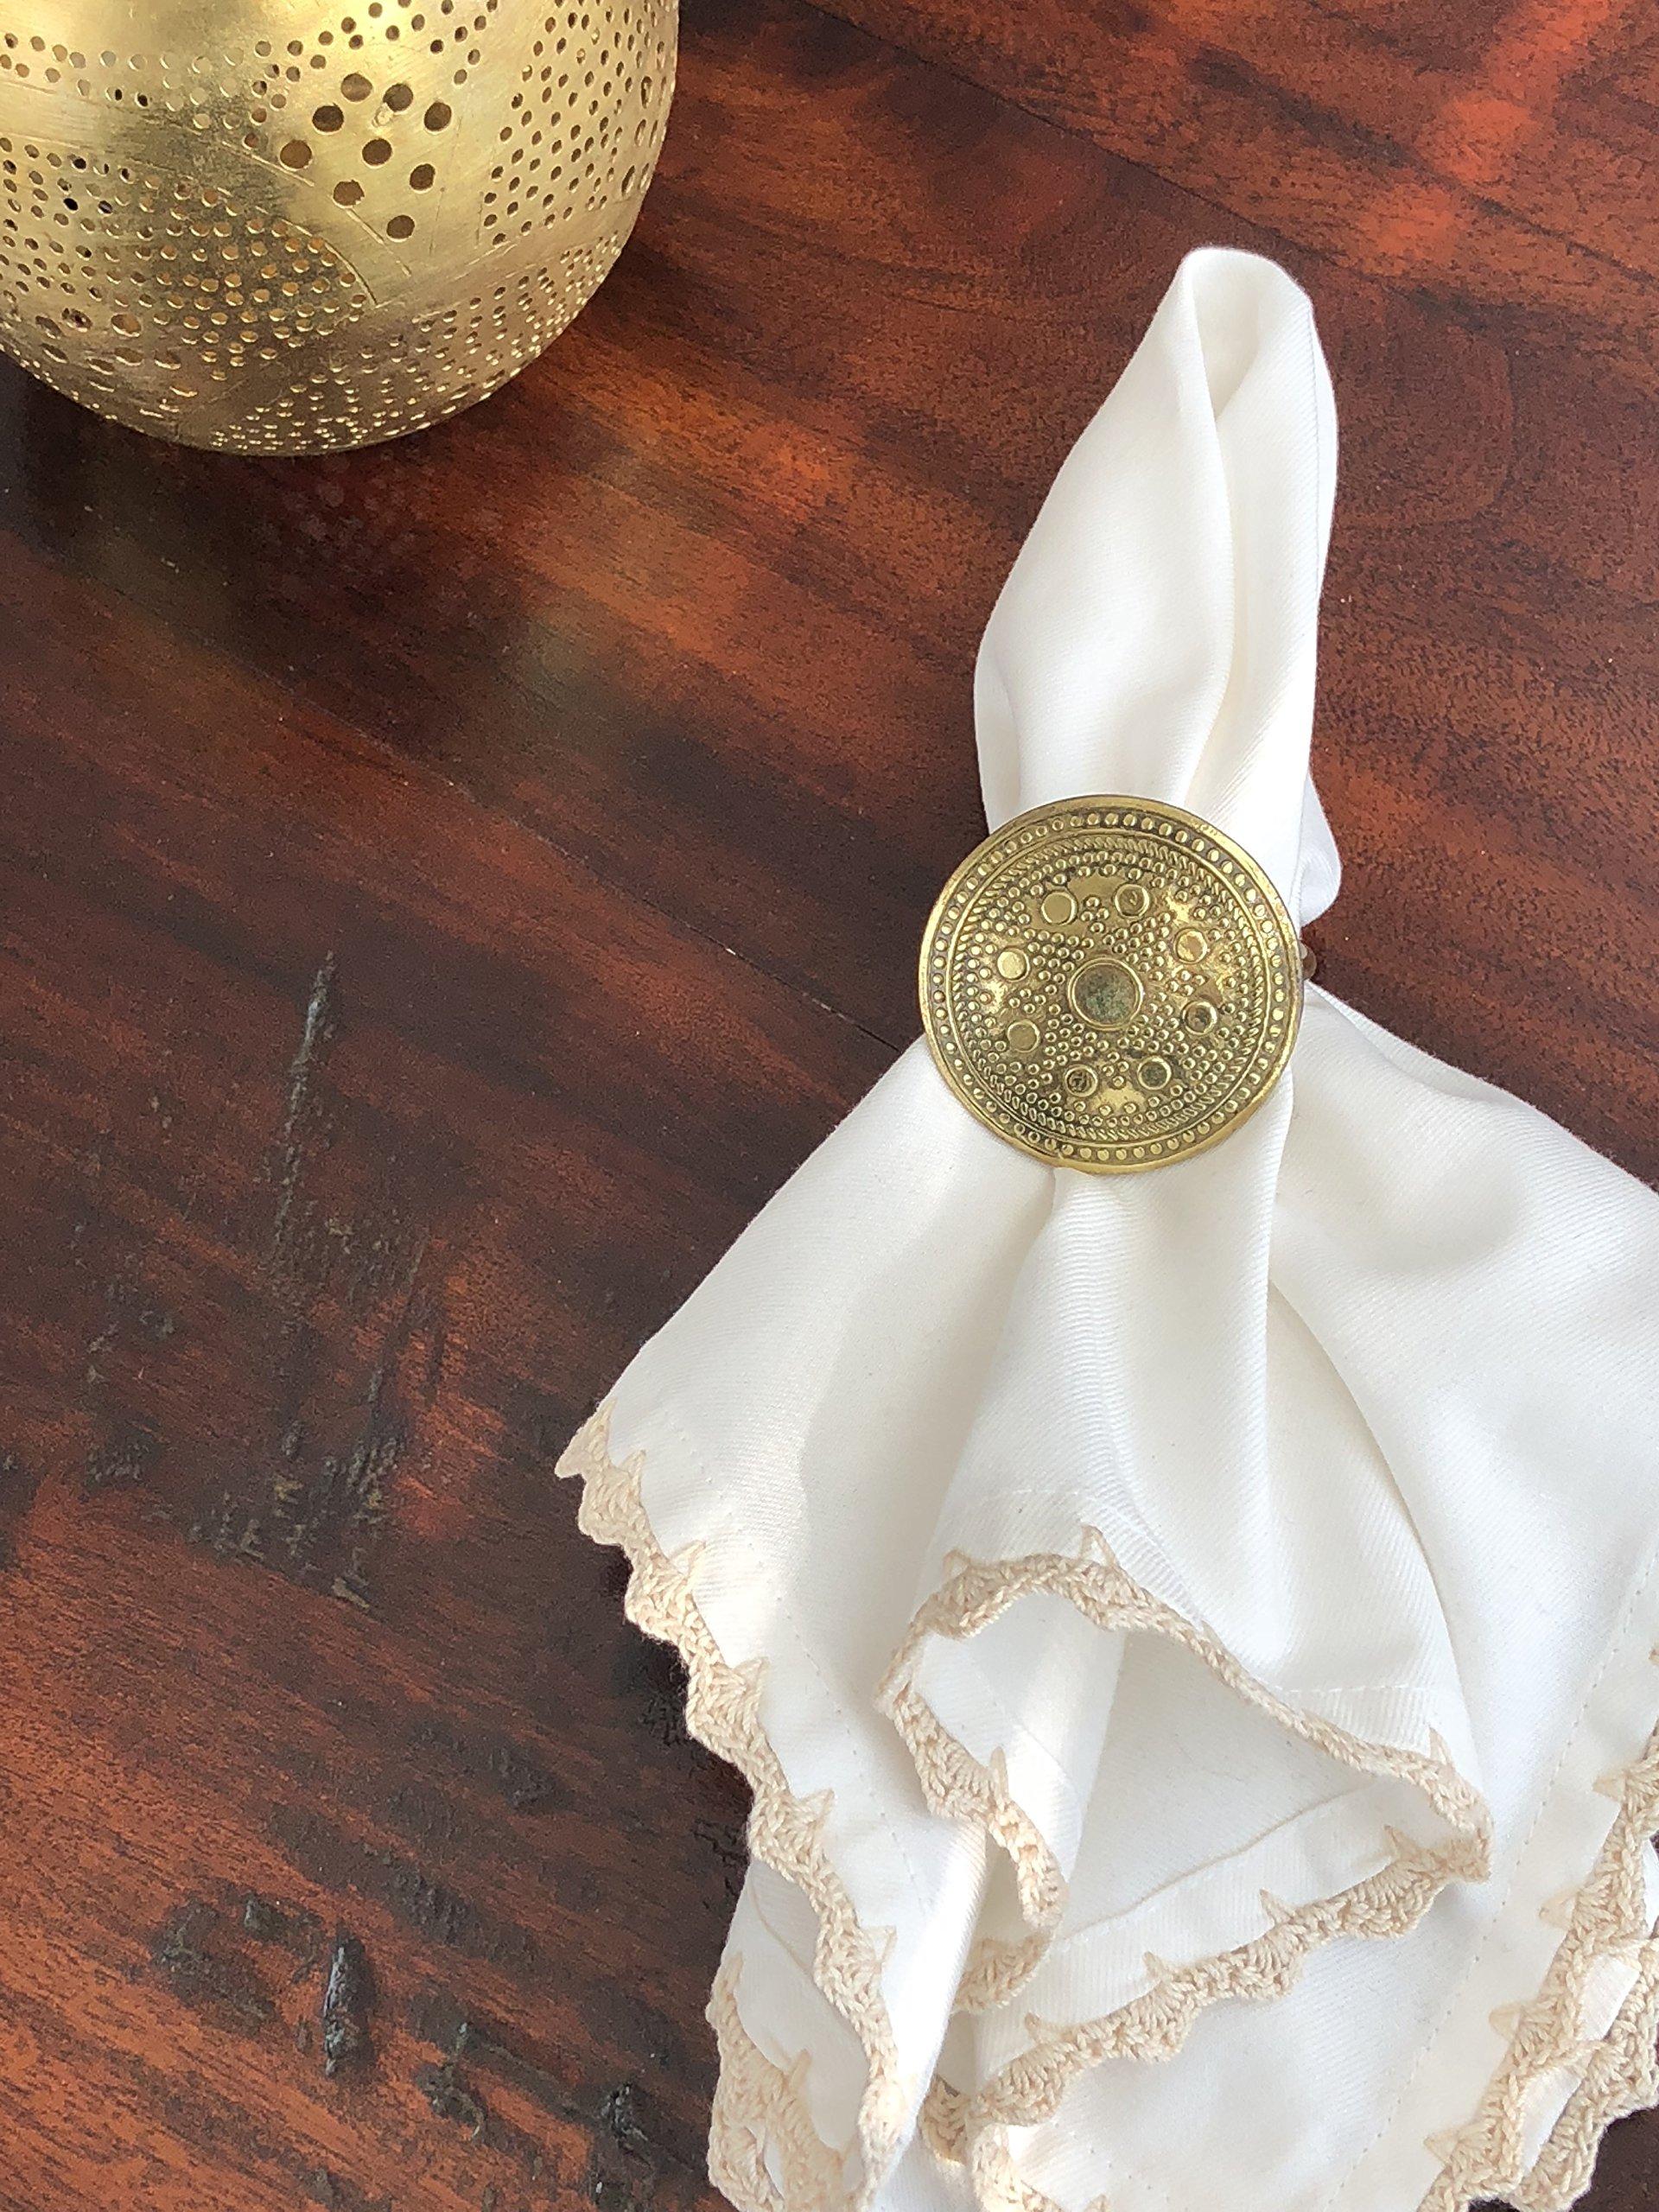 MoLi 100% Egyptian Cotton Cloth Dinner Napkins Hand Crocheted - Set of 6 Pack Lunch Linen - Elegant Decorative Fabric Handmade Table Linens - Servilletas de Tela Wedding Napkin (White) by MoLi (Image #6)